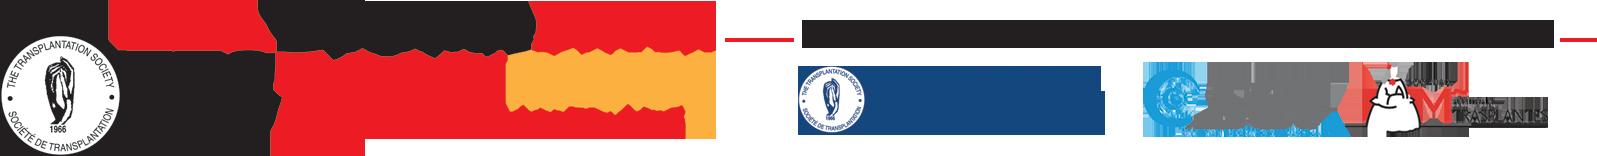 International Congress of The Transplantation Society Bi-Annual Meeting Abstract Deadline